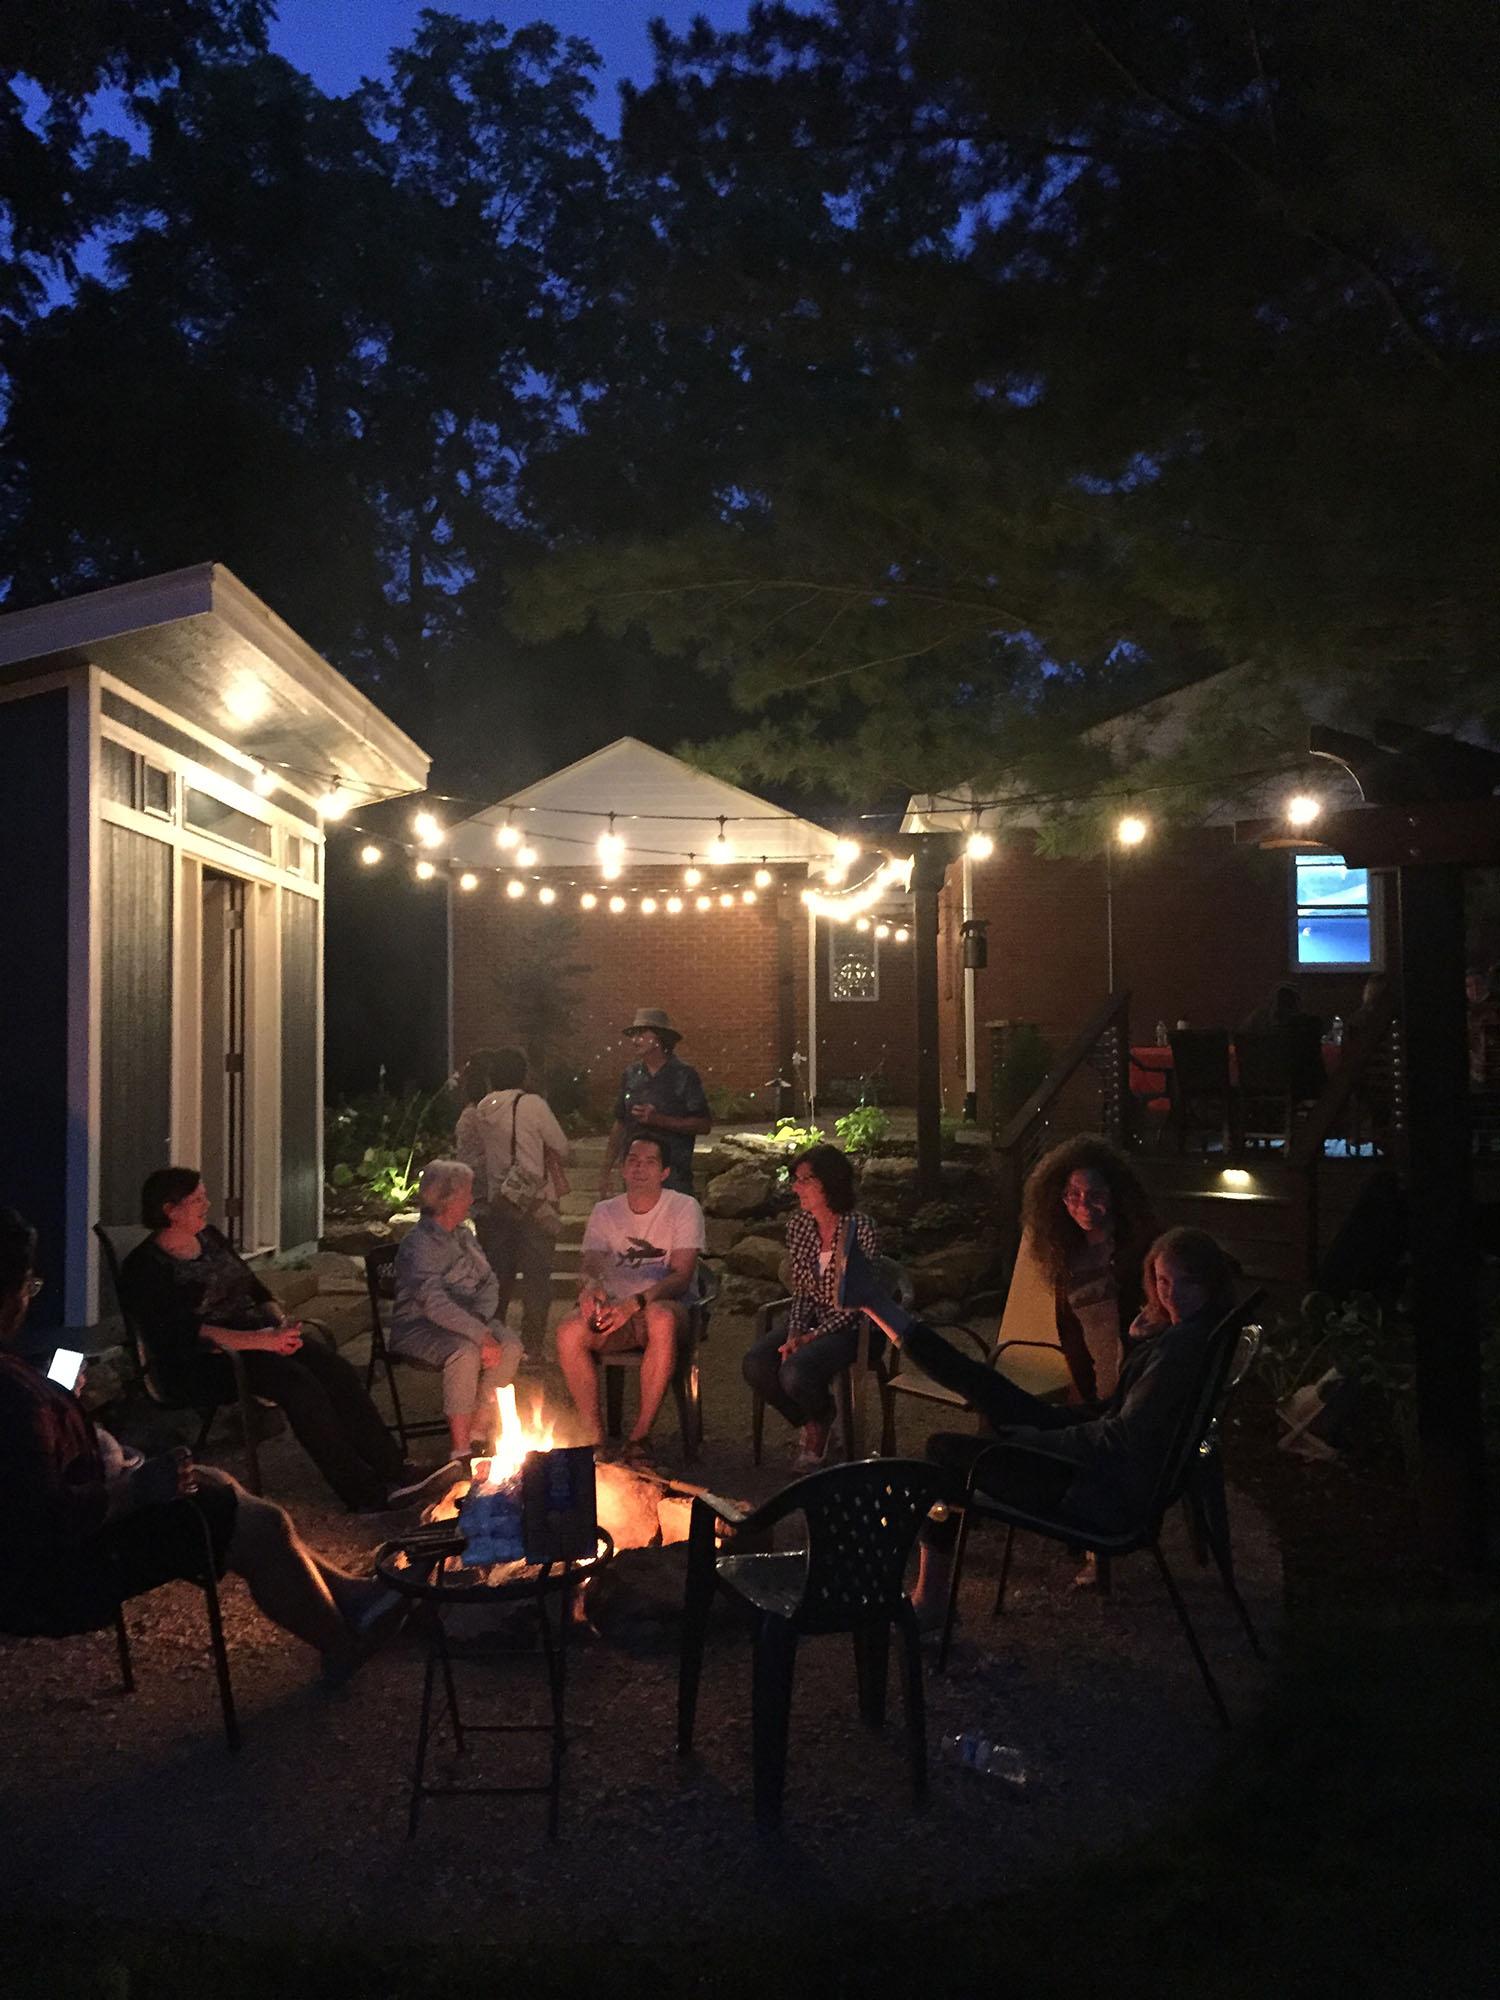 wolfe-lighting-patio_web_030118.jpg